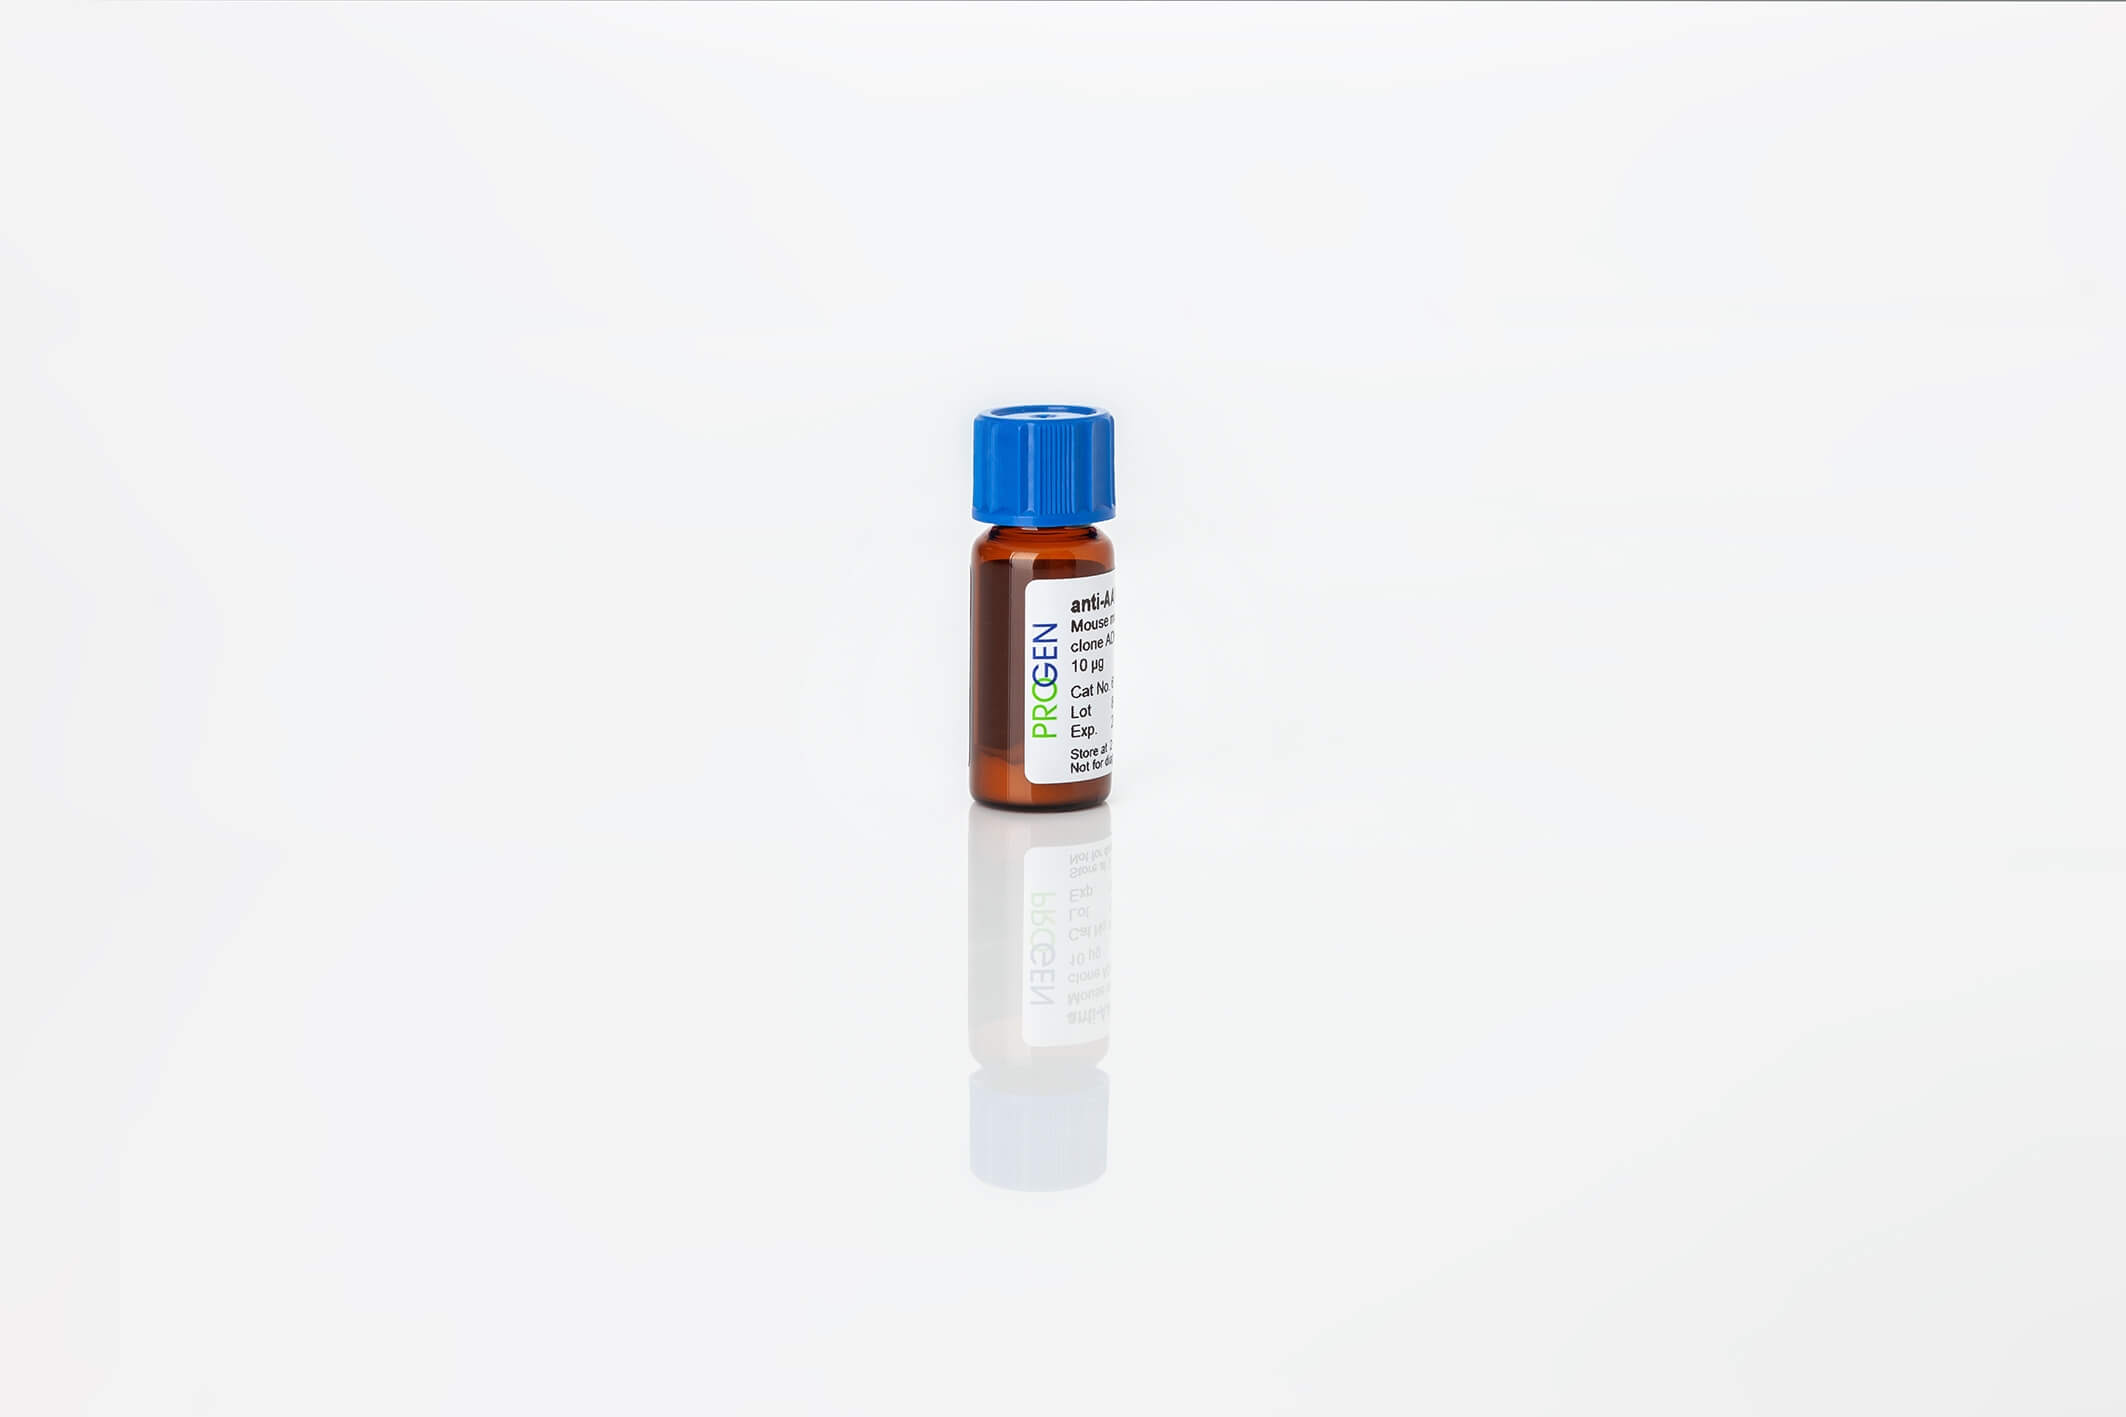 anti-Keratin K20 mouse monoclonal, IT-Ks20.5, lyophilized, purified